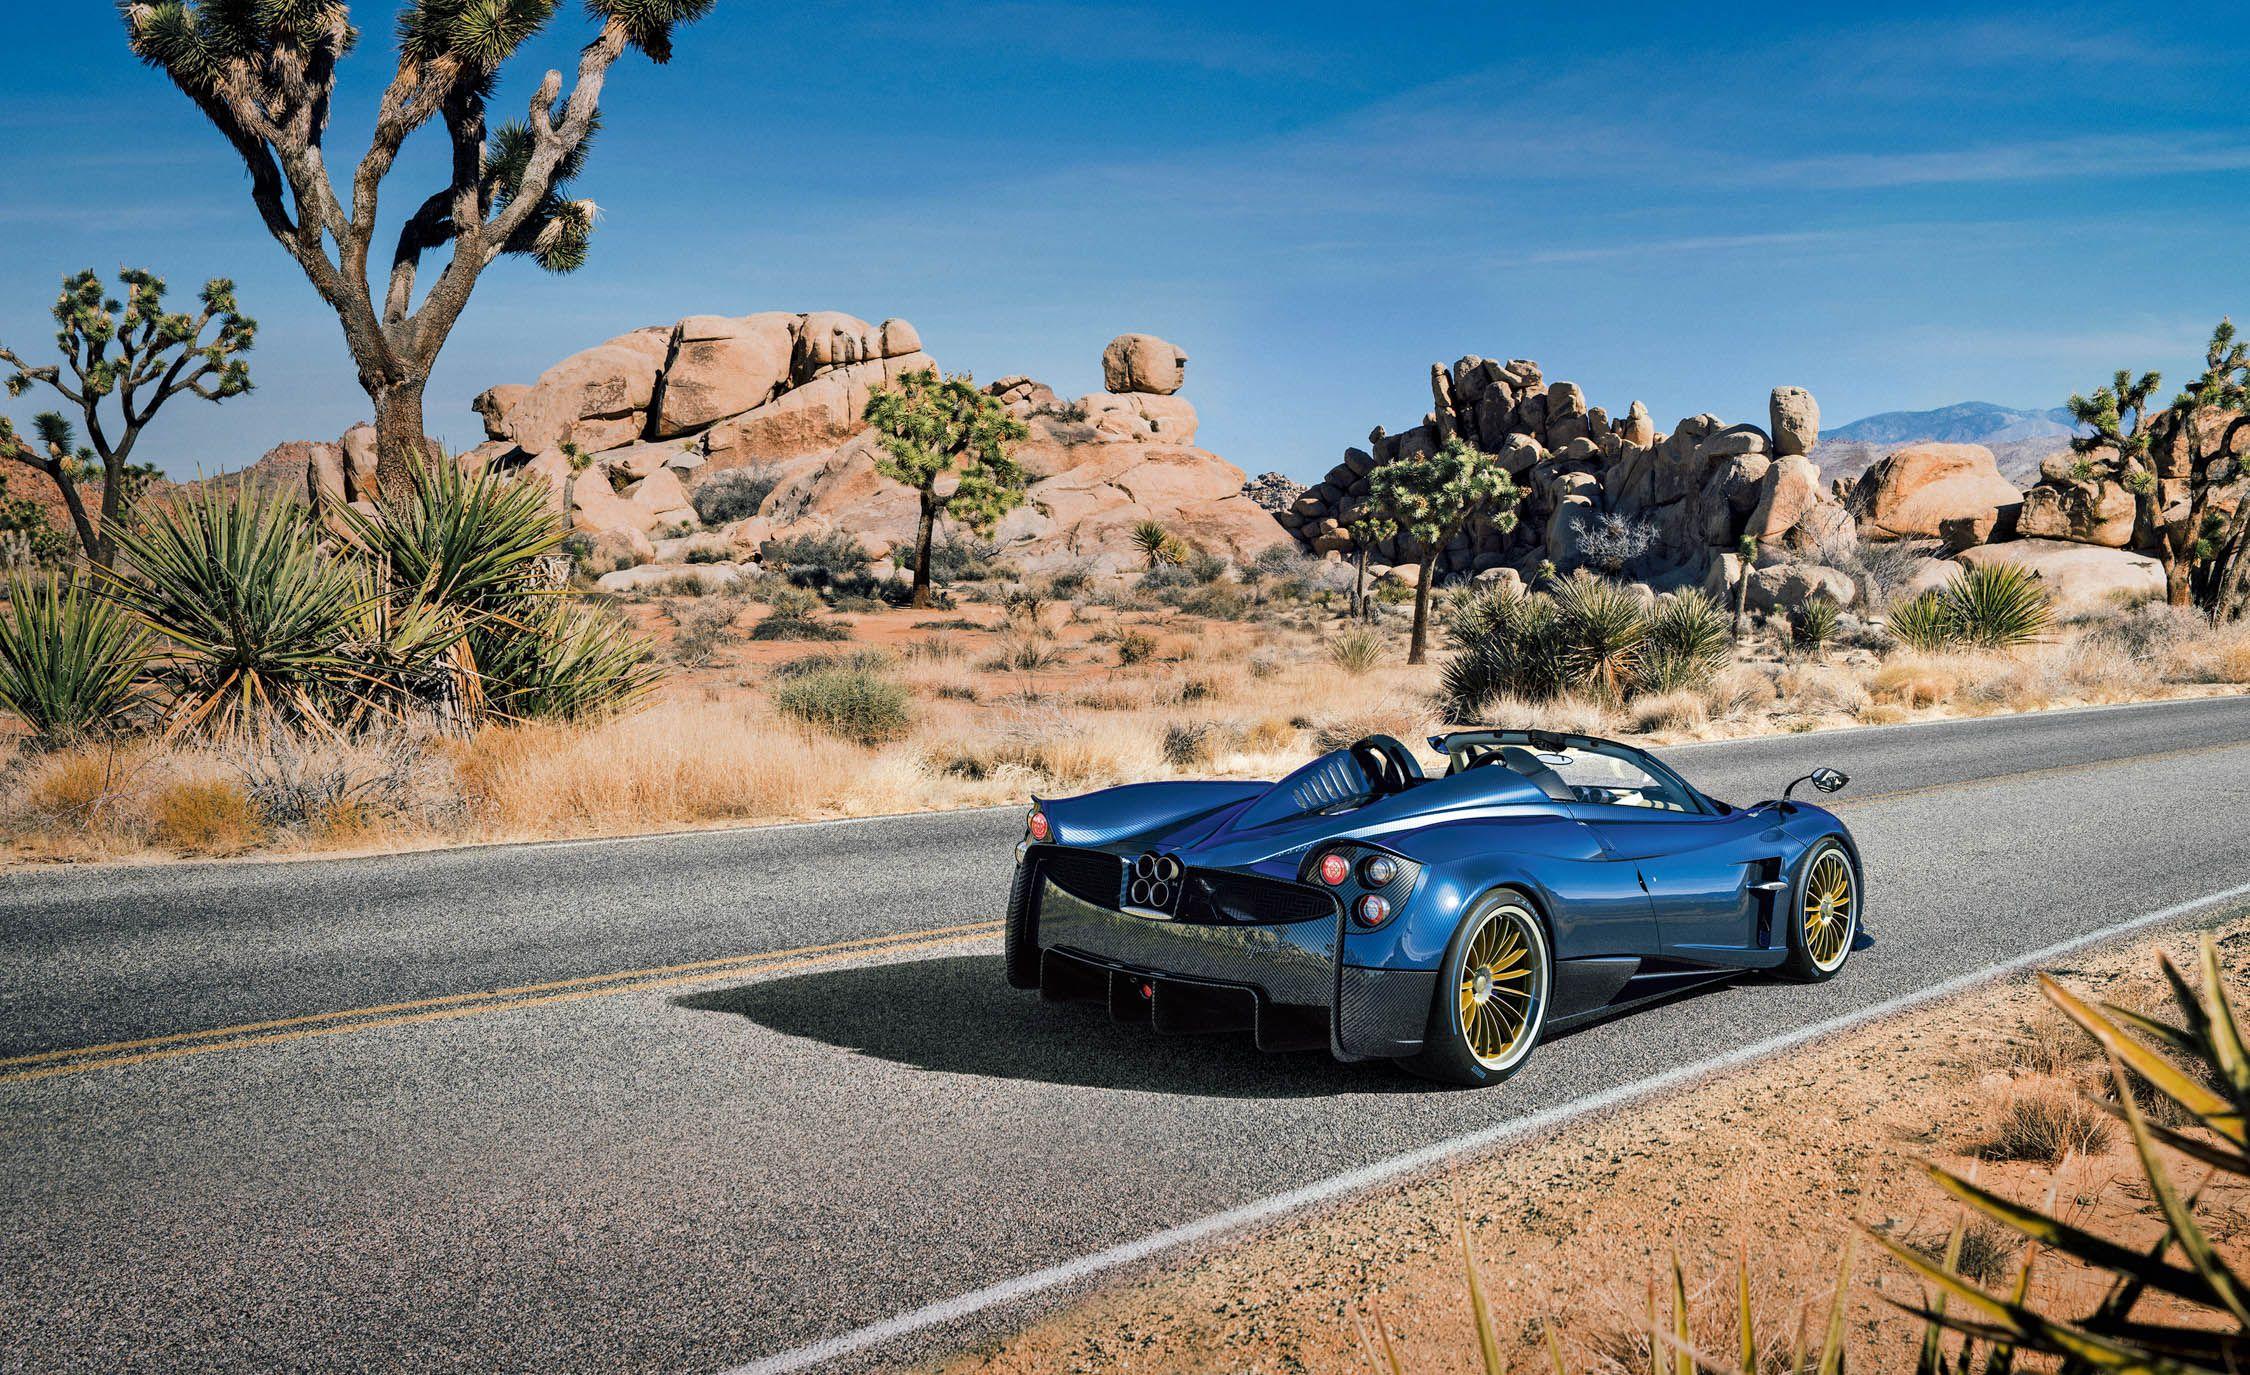 2018 Pagani Huayra Reviews Pagani Huayra Price Photos And Specs